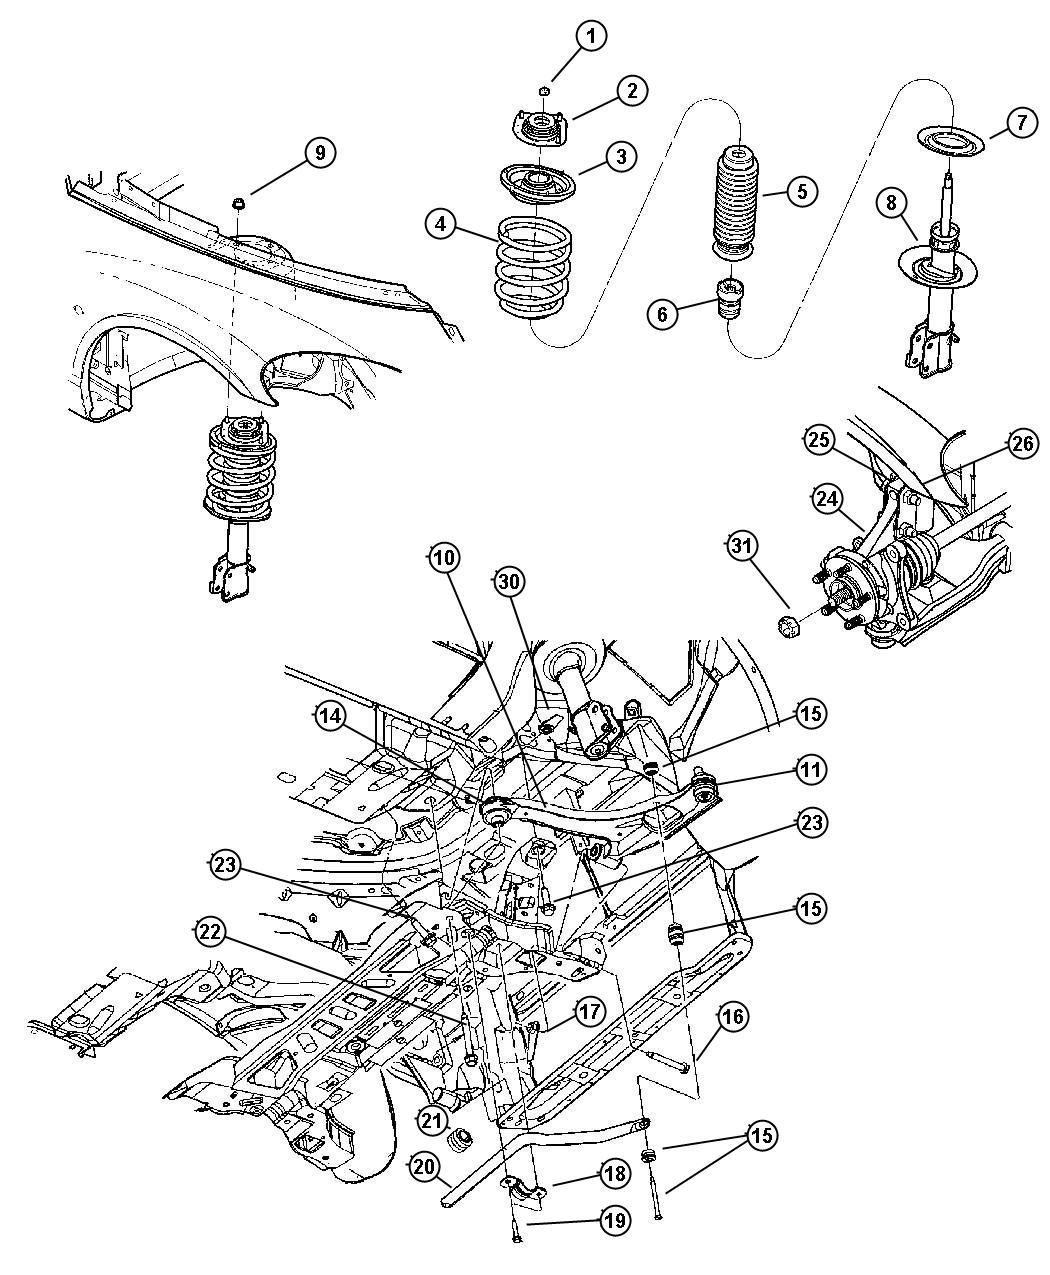 02 Chrysler Pt Cruiser Vacuum Diagram. Chrysler. Auto